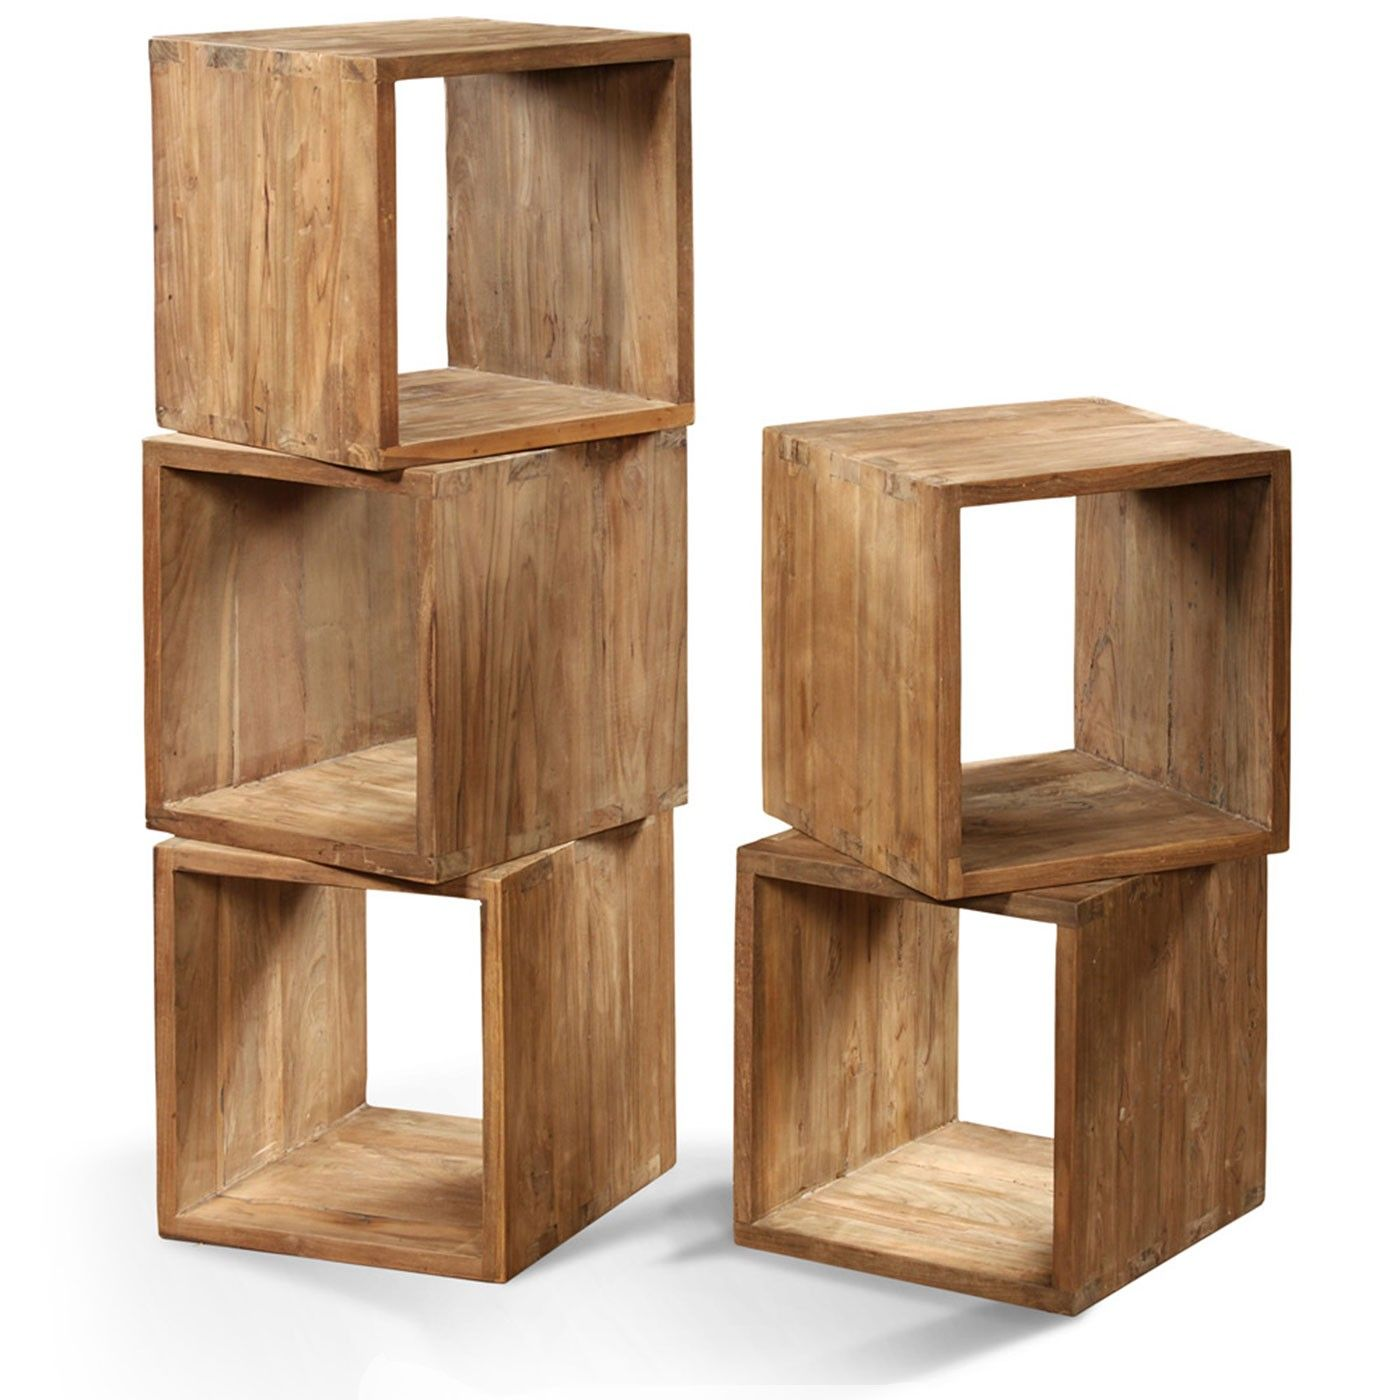 Lifestyle Storage Cube 2 5cm Frame Shelves Storage Living